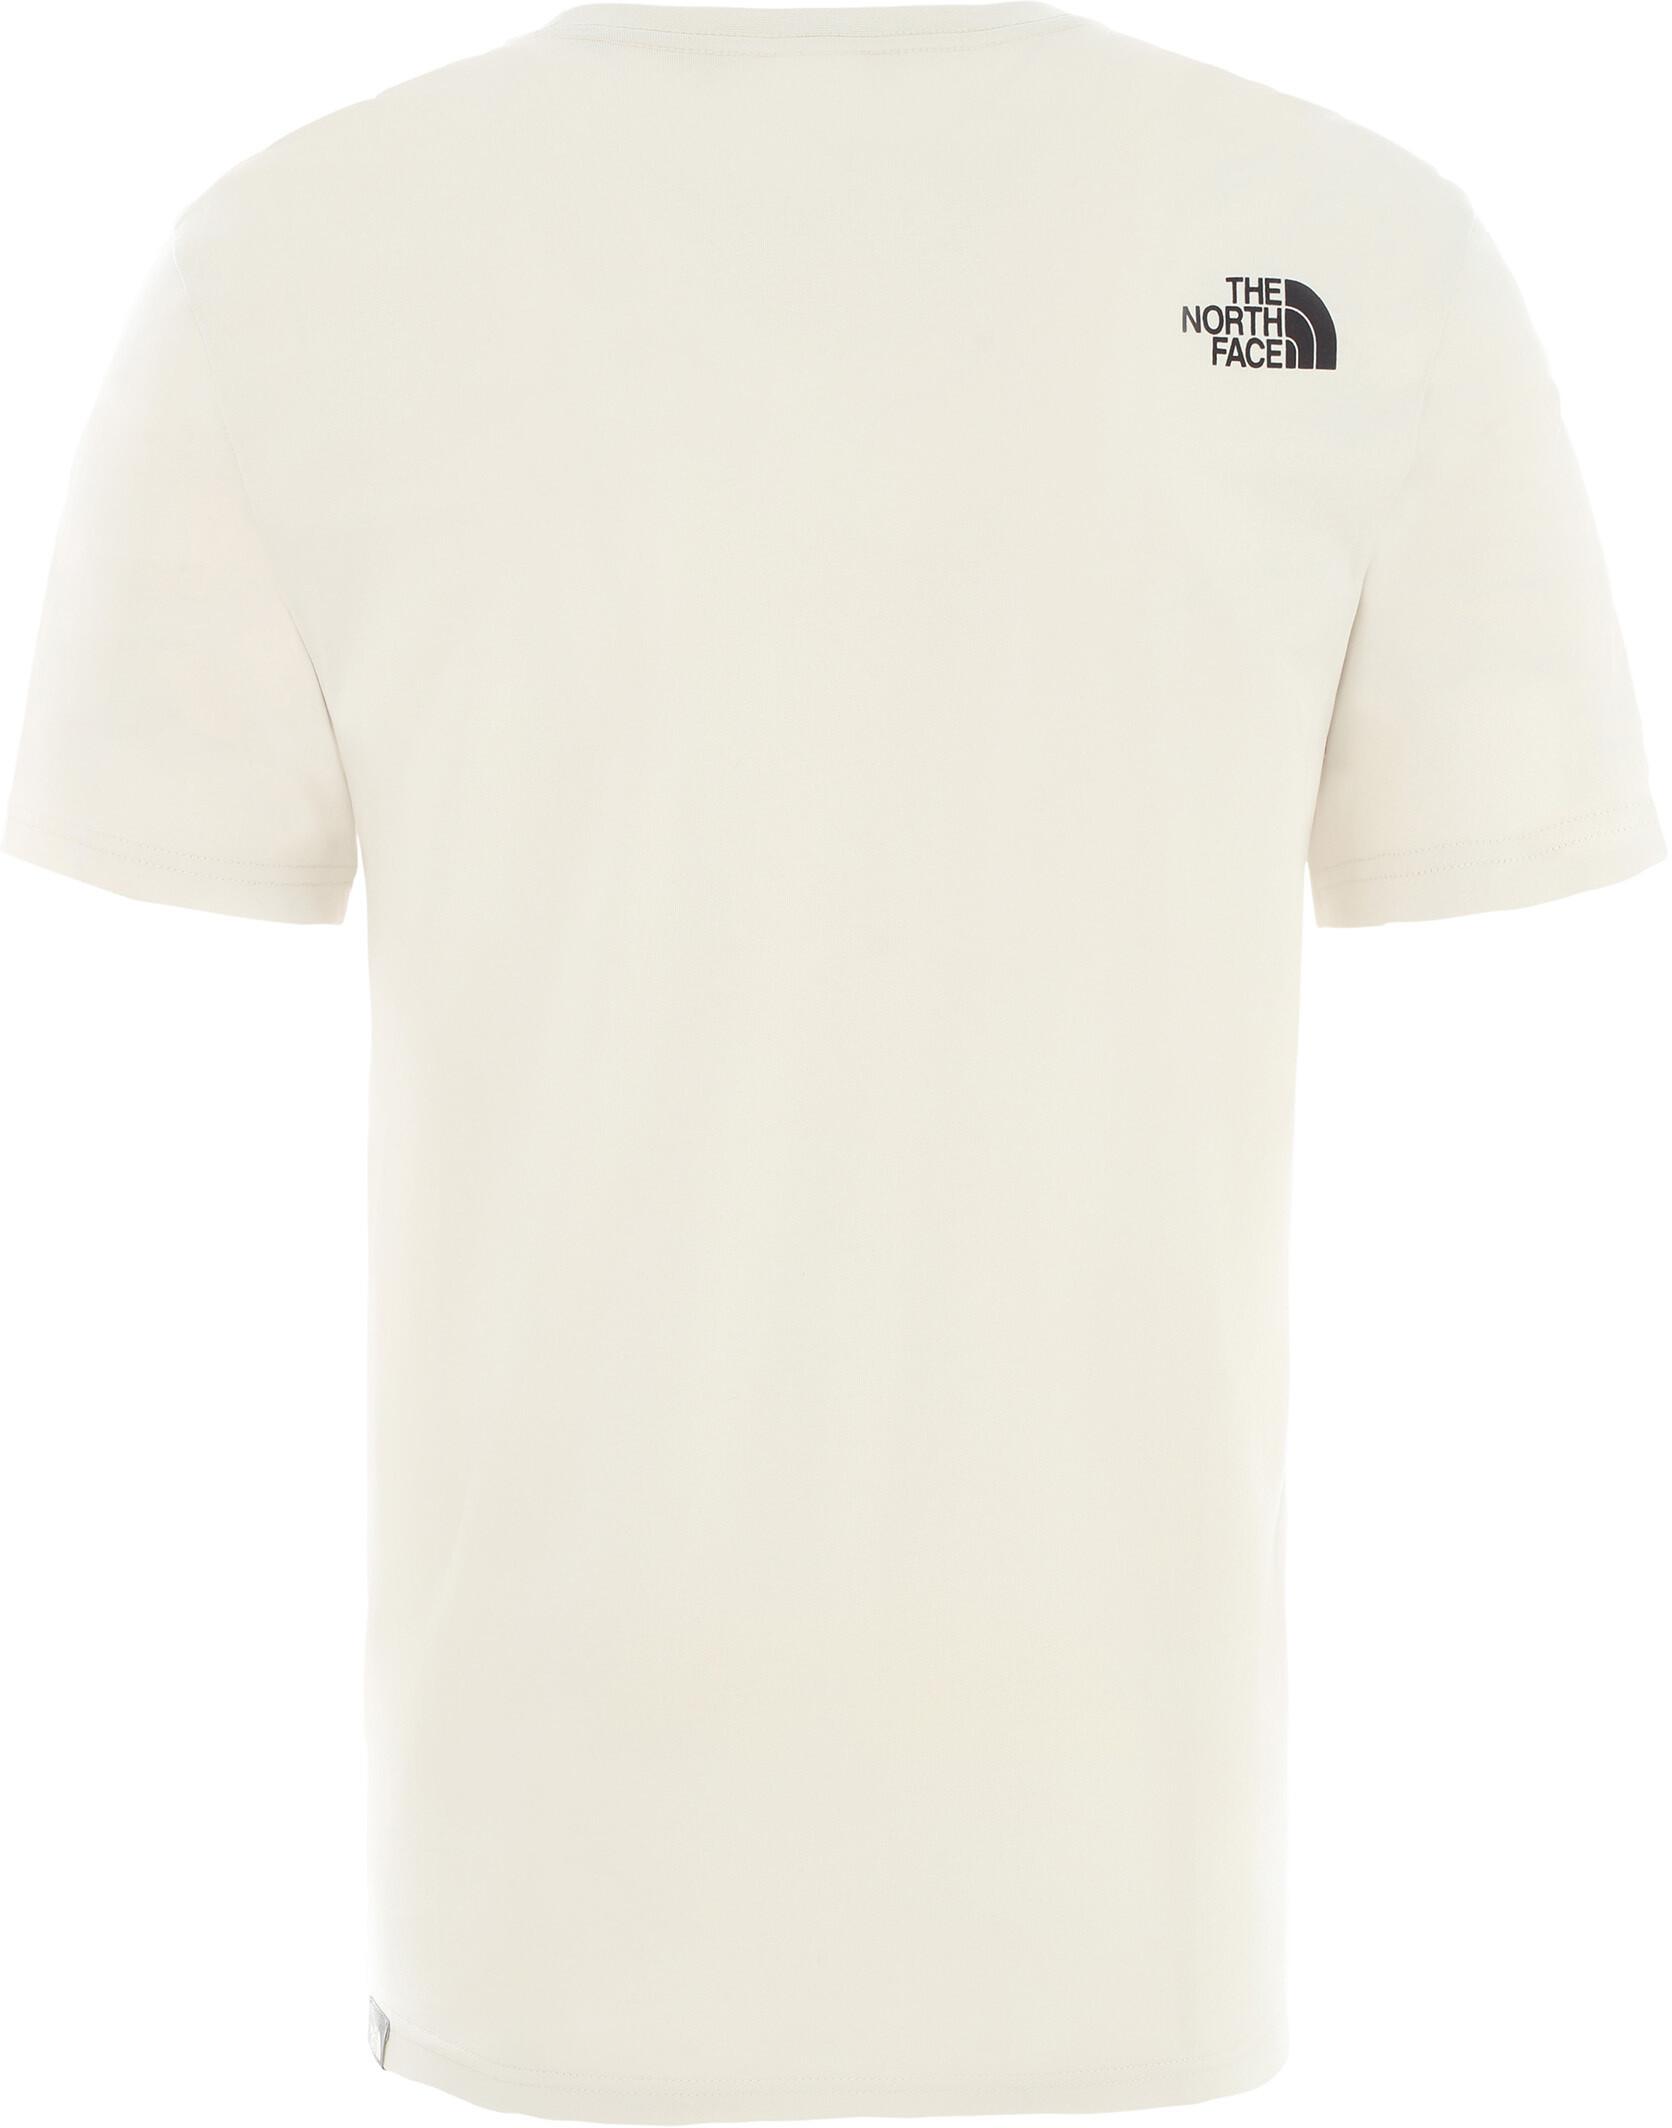 The North Face Rust 2 Koszulka z krótkim rękawem Mężczyźni, vintage white/tnf black (2020)